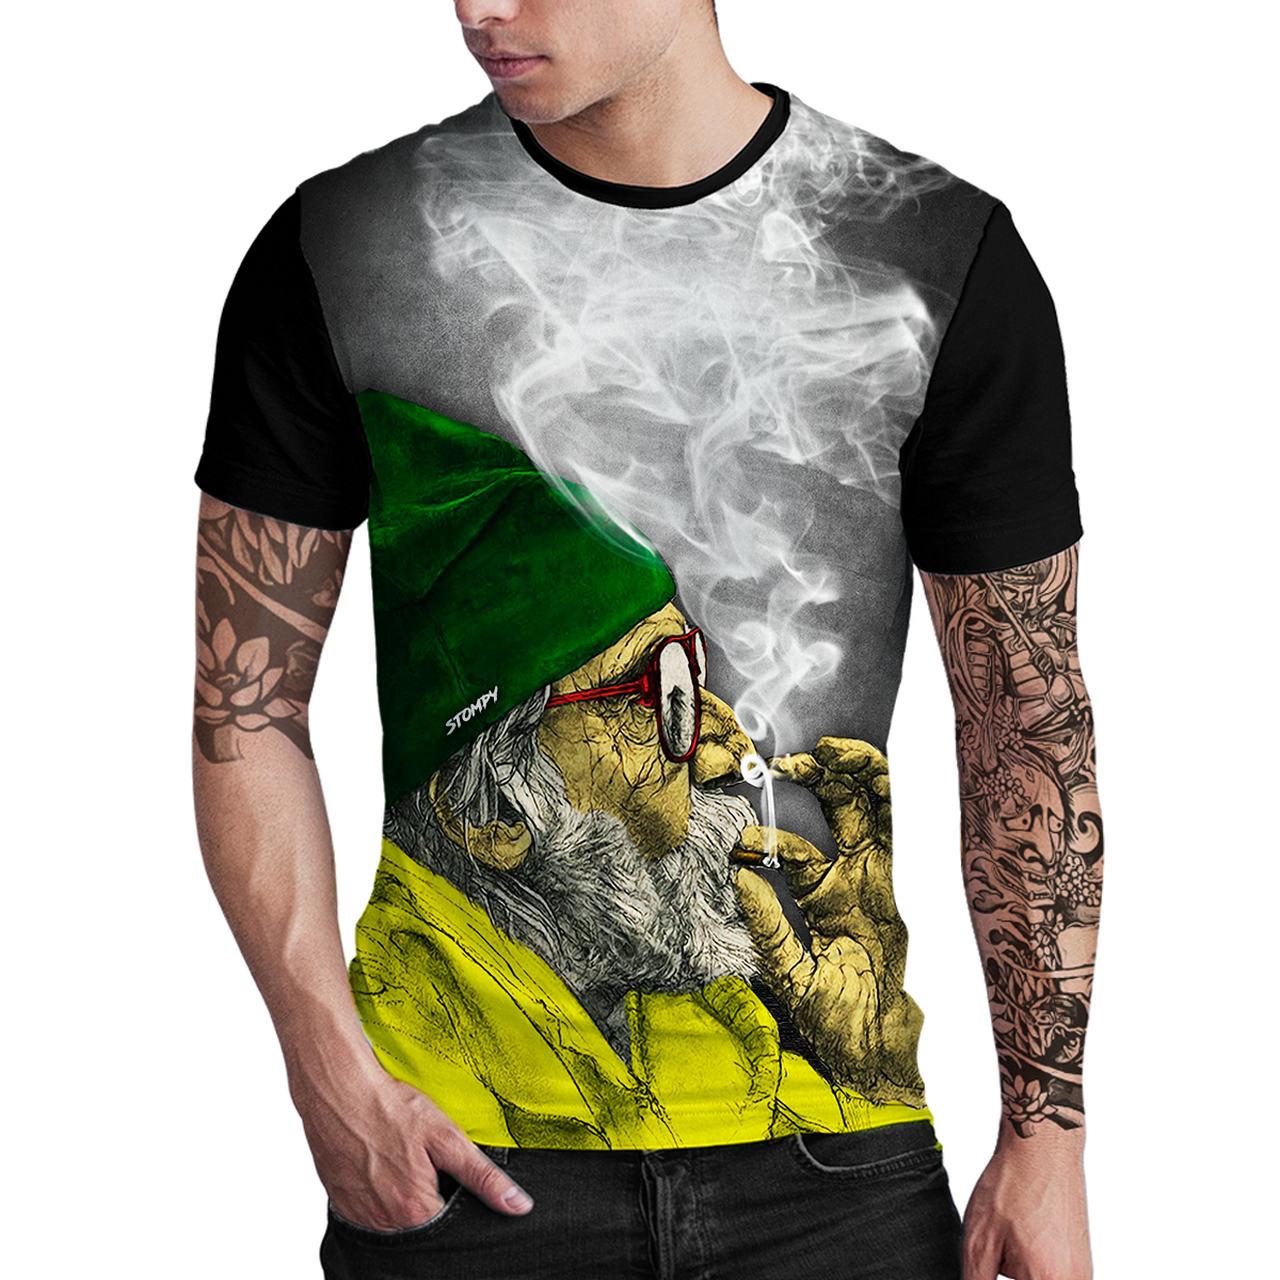 Stompy Camiseta Estampada Masculina Modelo 32